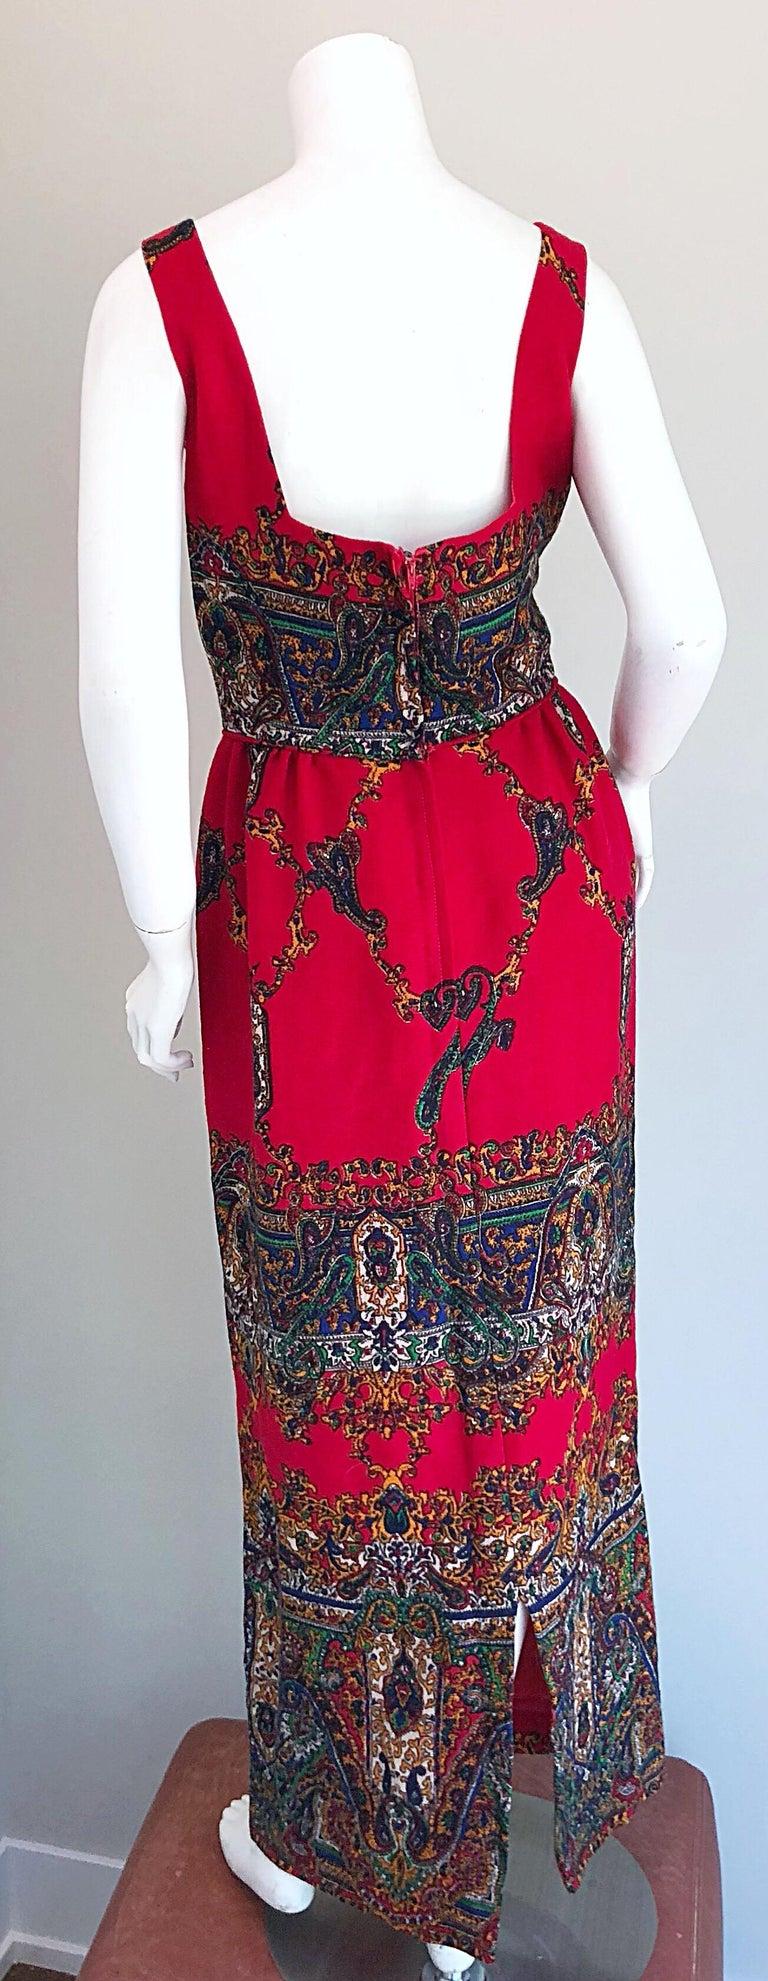 Vintage 1970\u2019s Red and Black Floral Print Boho House Dress